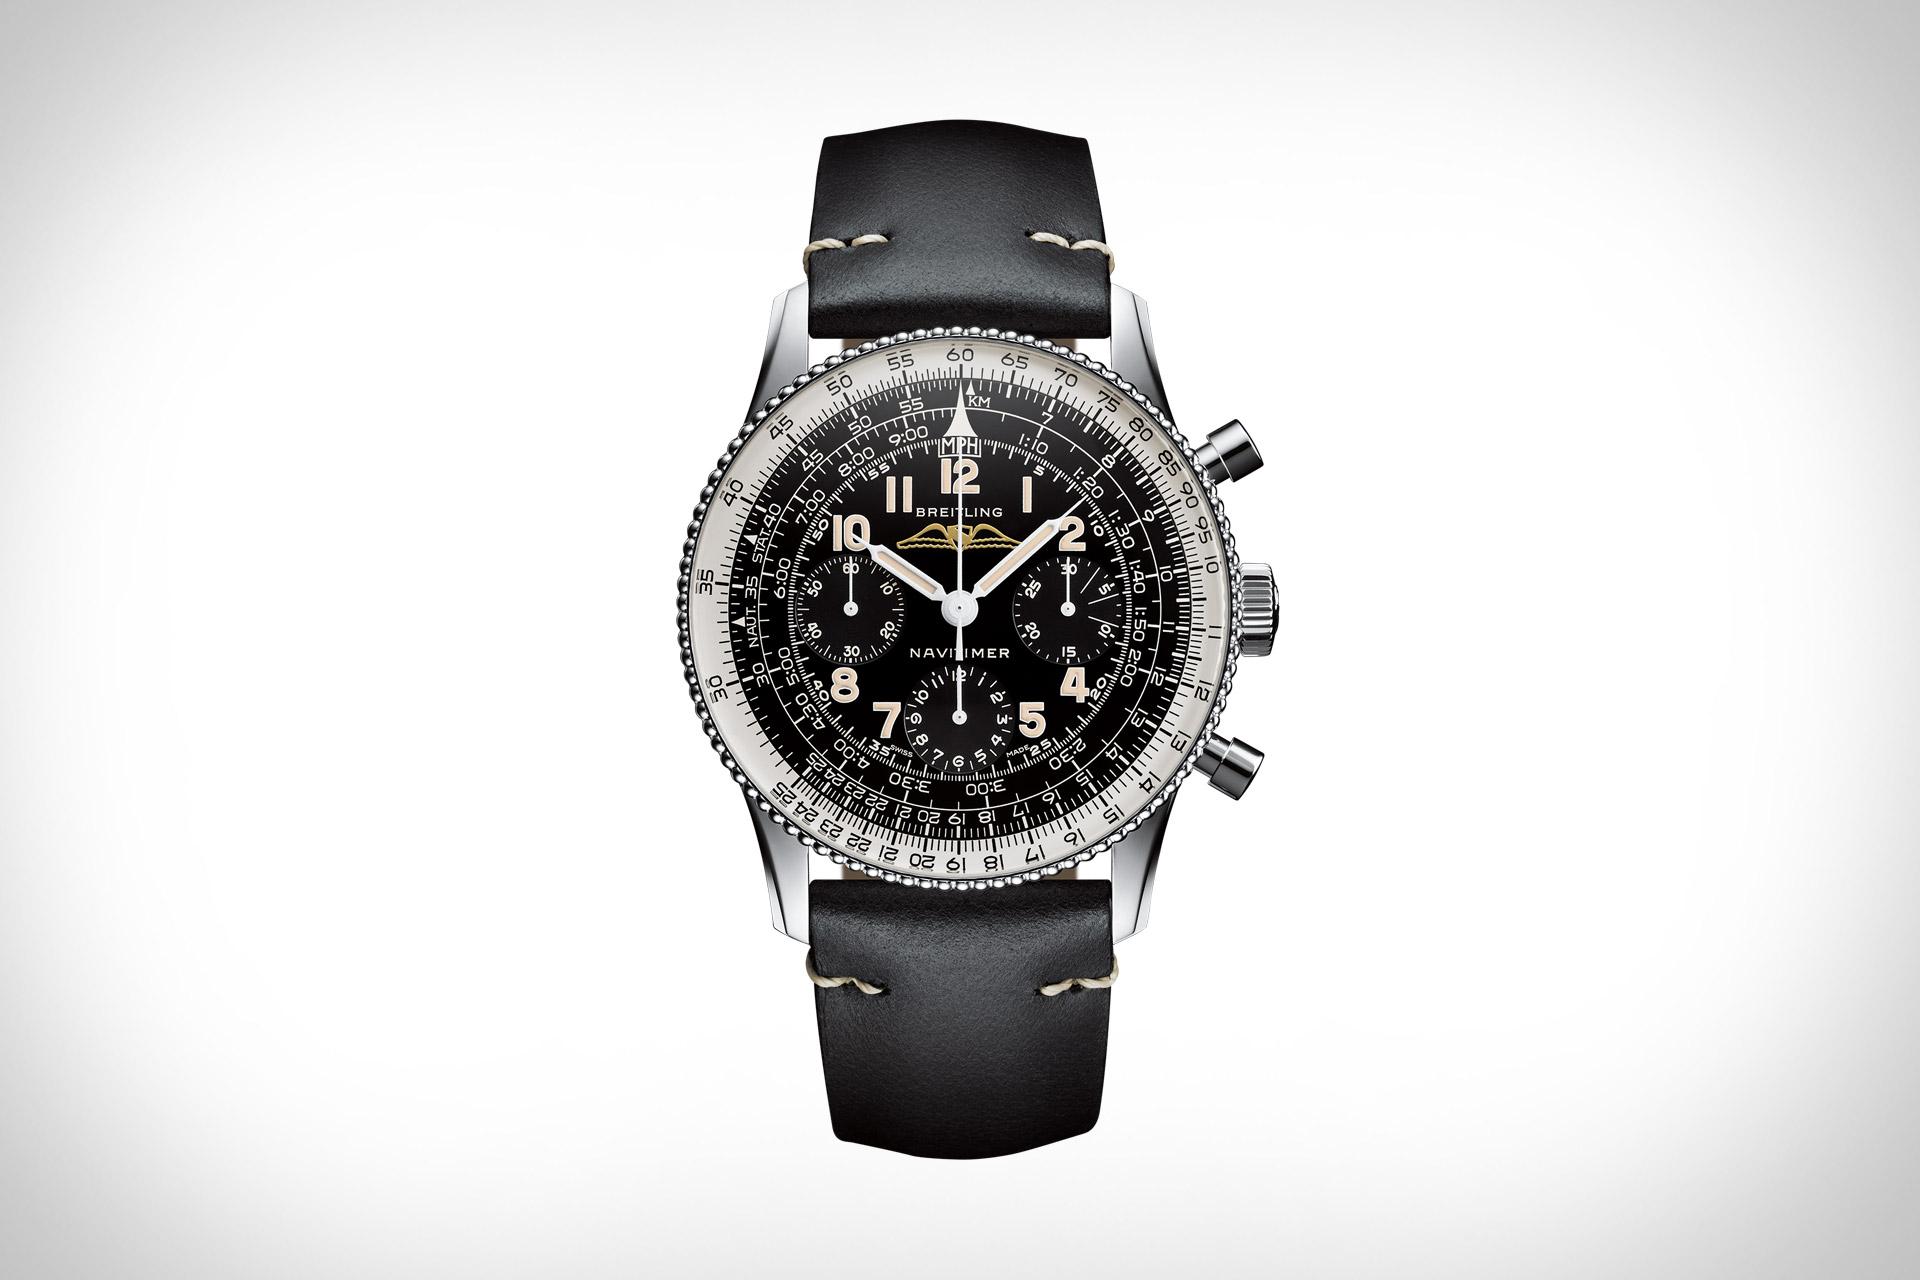 Breitling Navitimer Ref. 806 1959 Watch